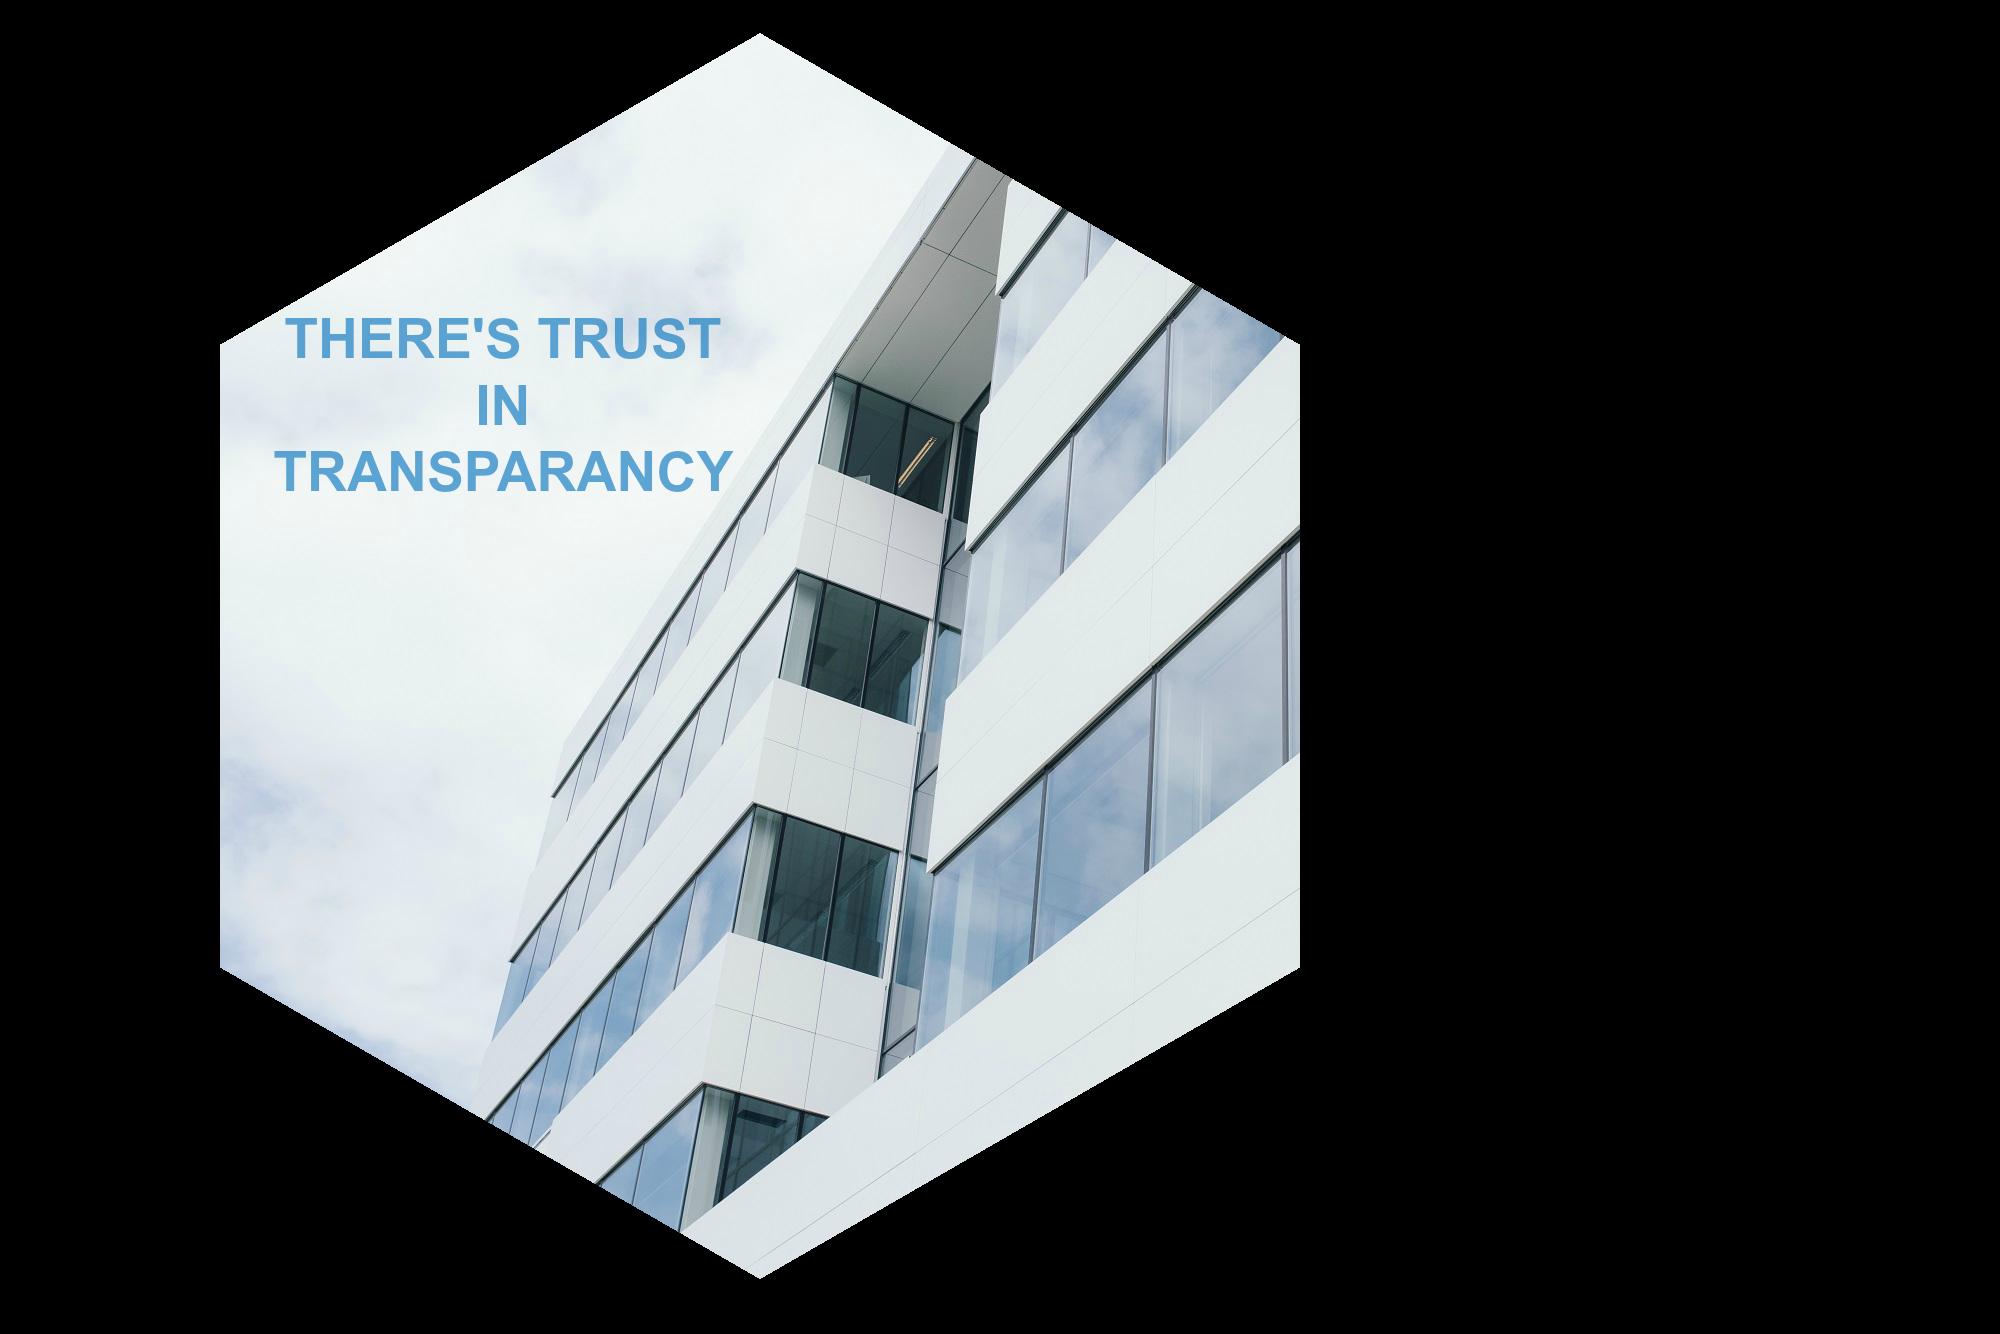 trust_transparancy.png